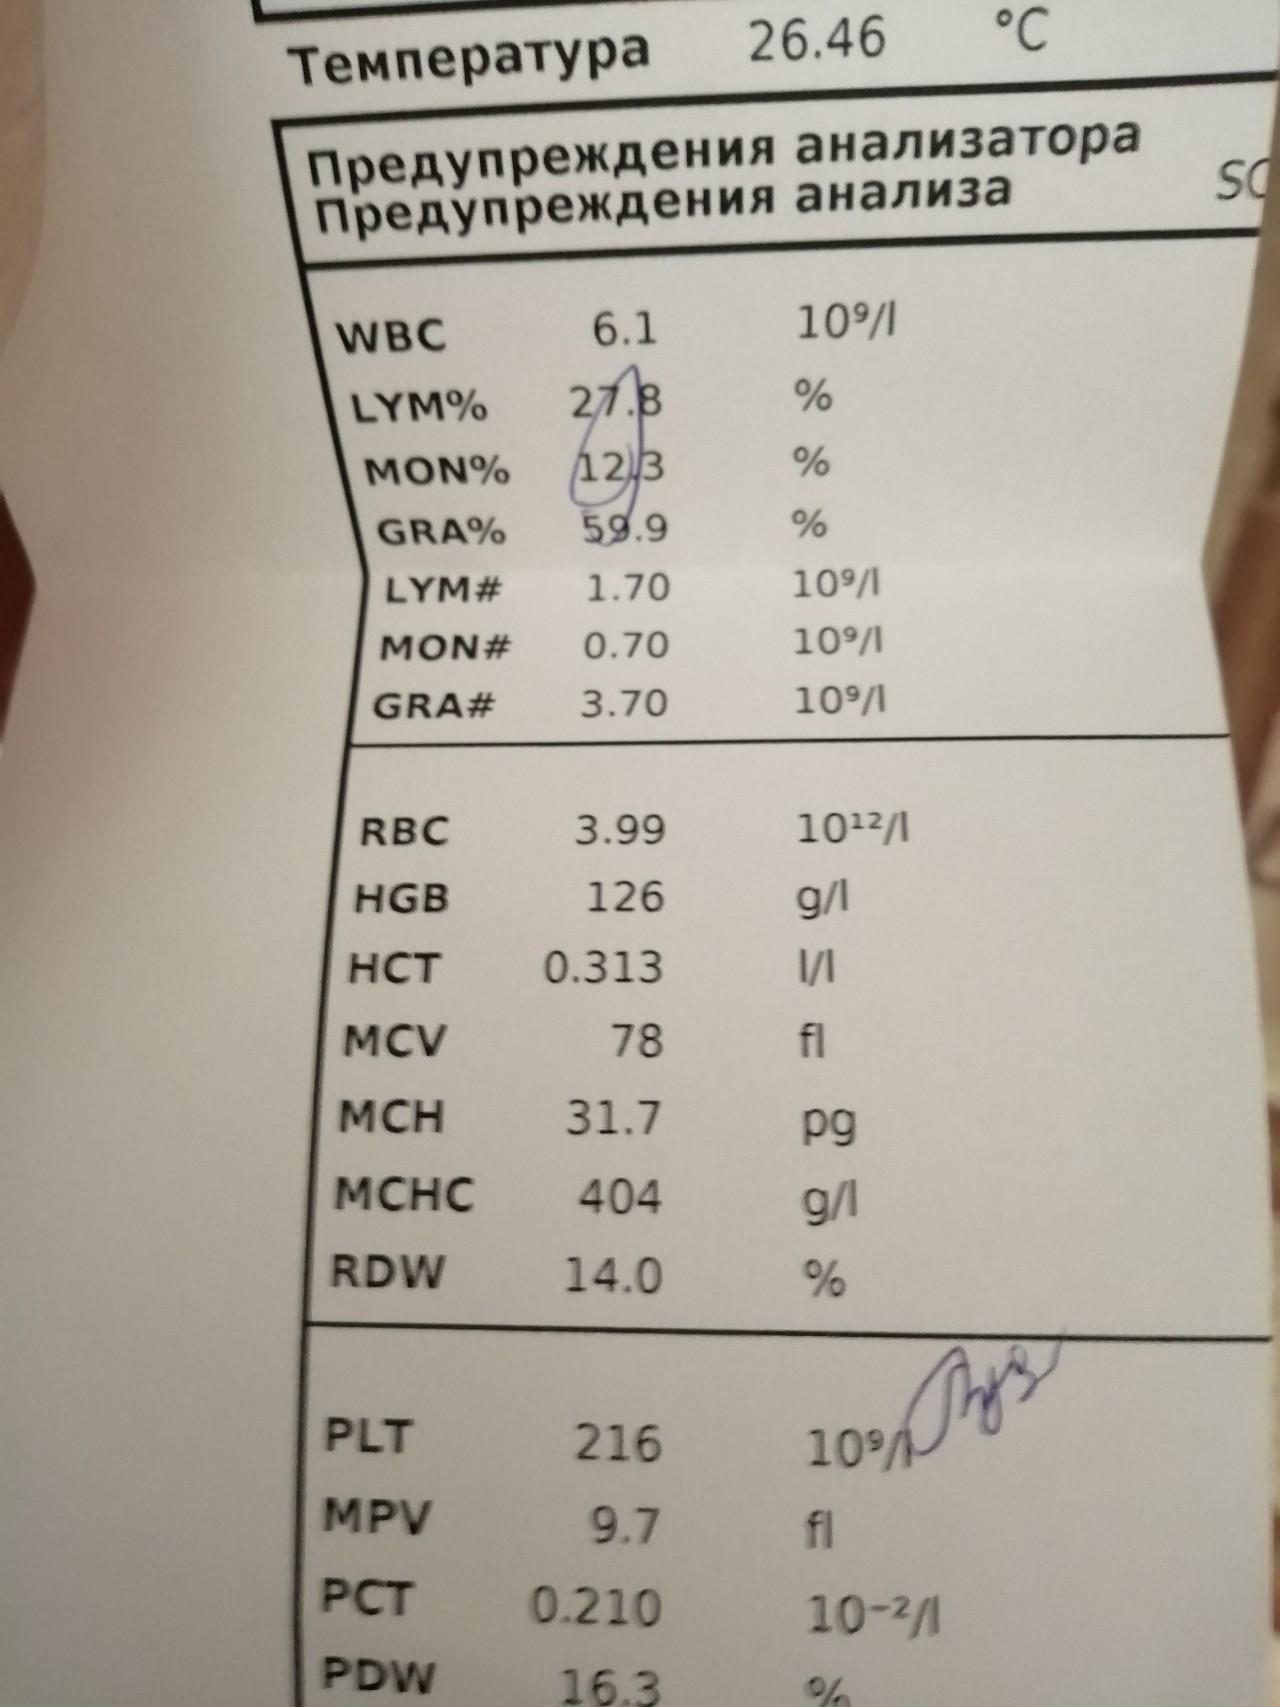 На развернутый сахар крови анализ на ярославль цены анализы гормоны